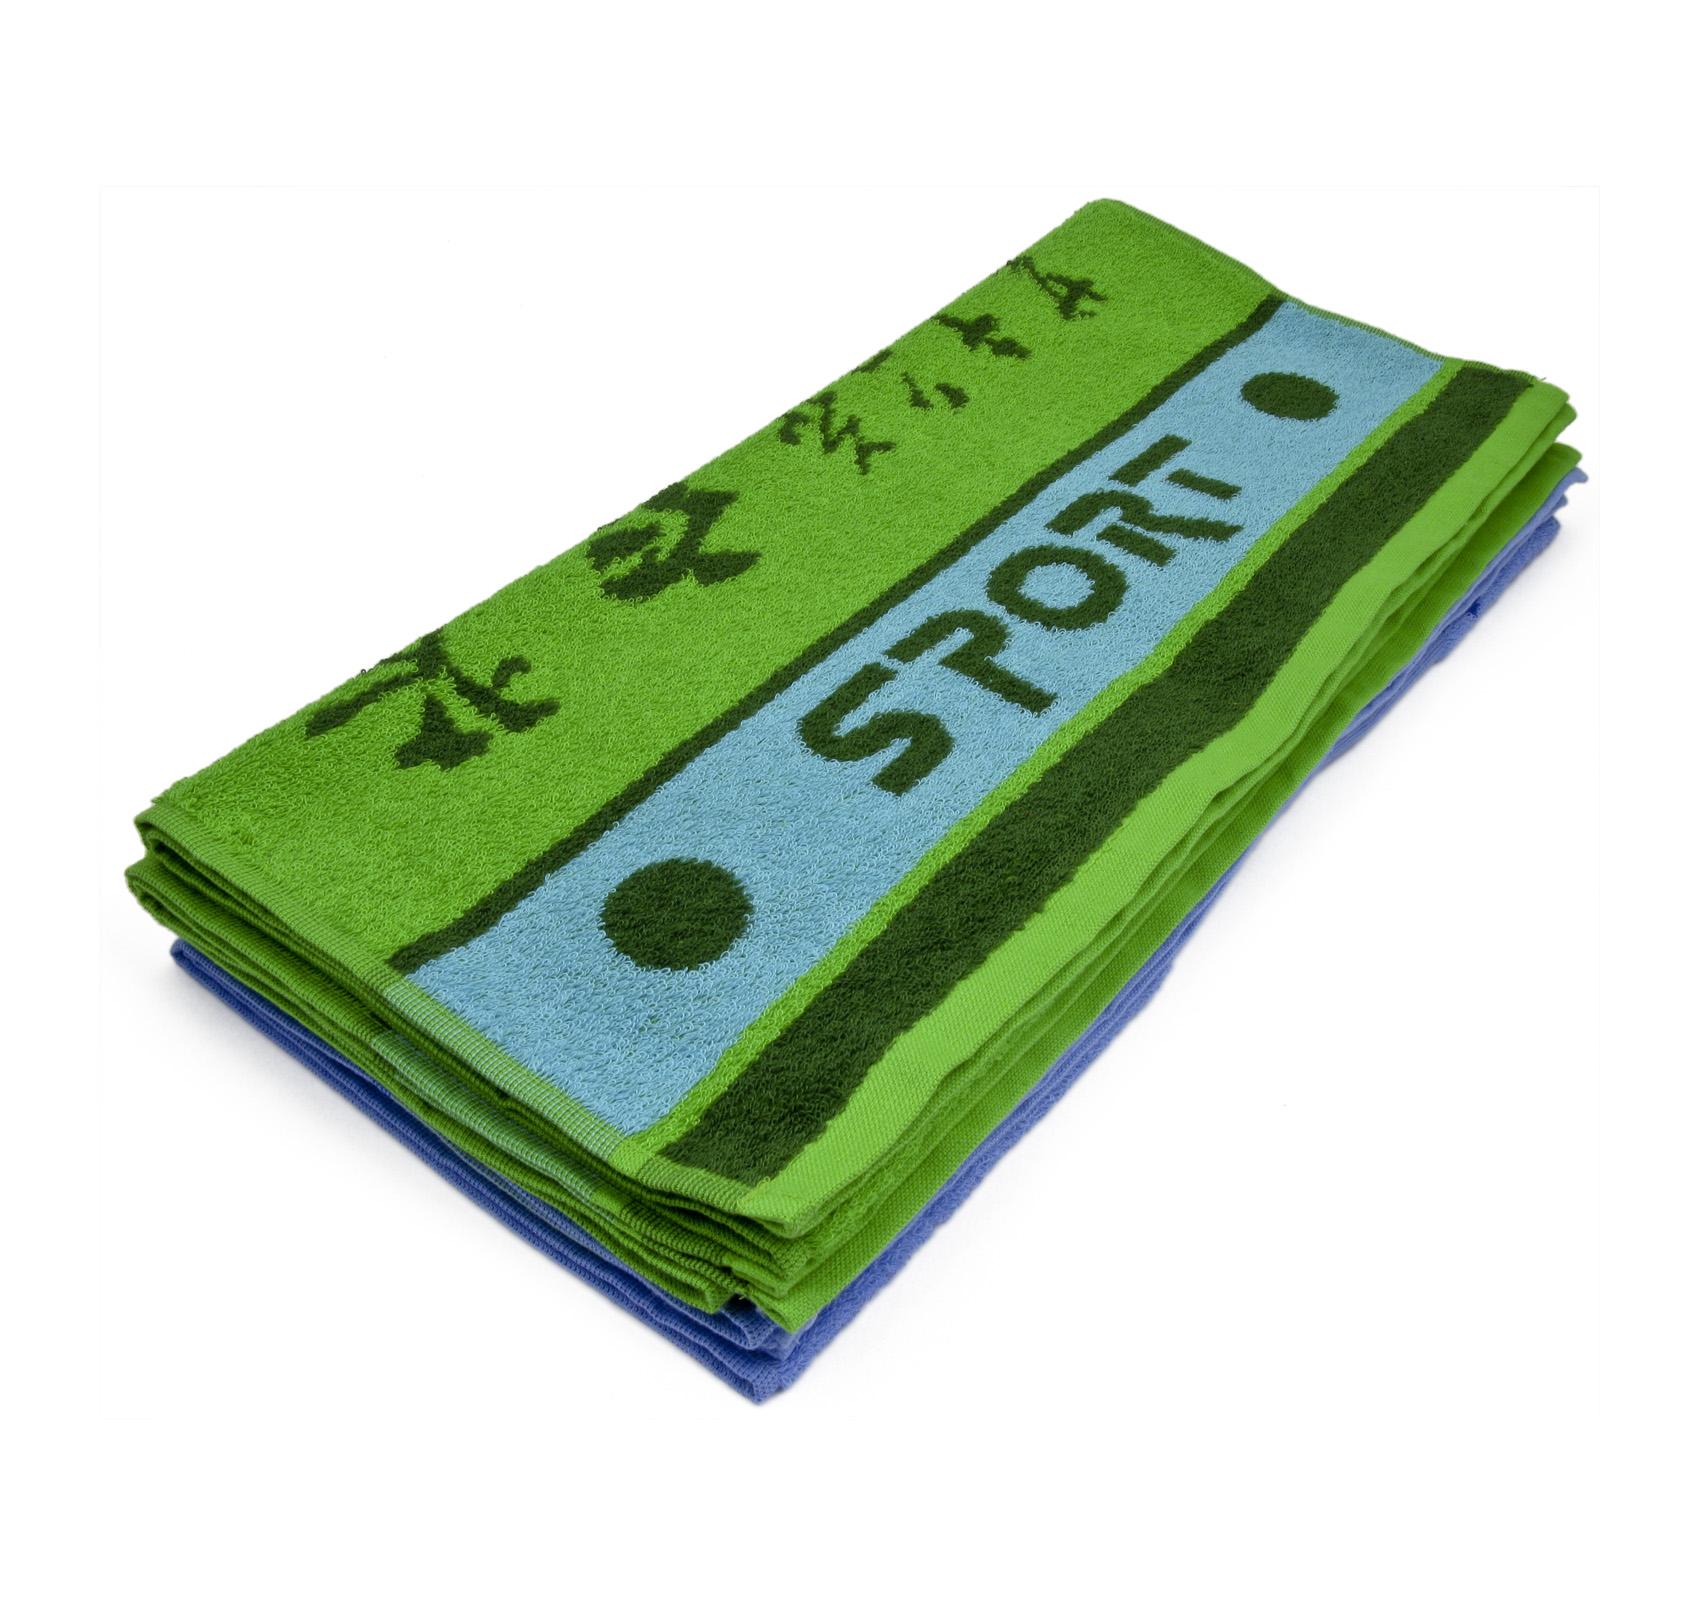 Полотенце Каратэ, цвет Зеленый, размер 50х90 смМахровые полотенца<br>Плотность ткани: 400 г/кв. м.<br><br>Тип: Полотенце<br>Размер: 50х90<br>Материал: Махра